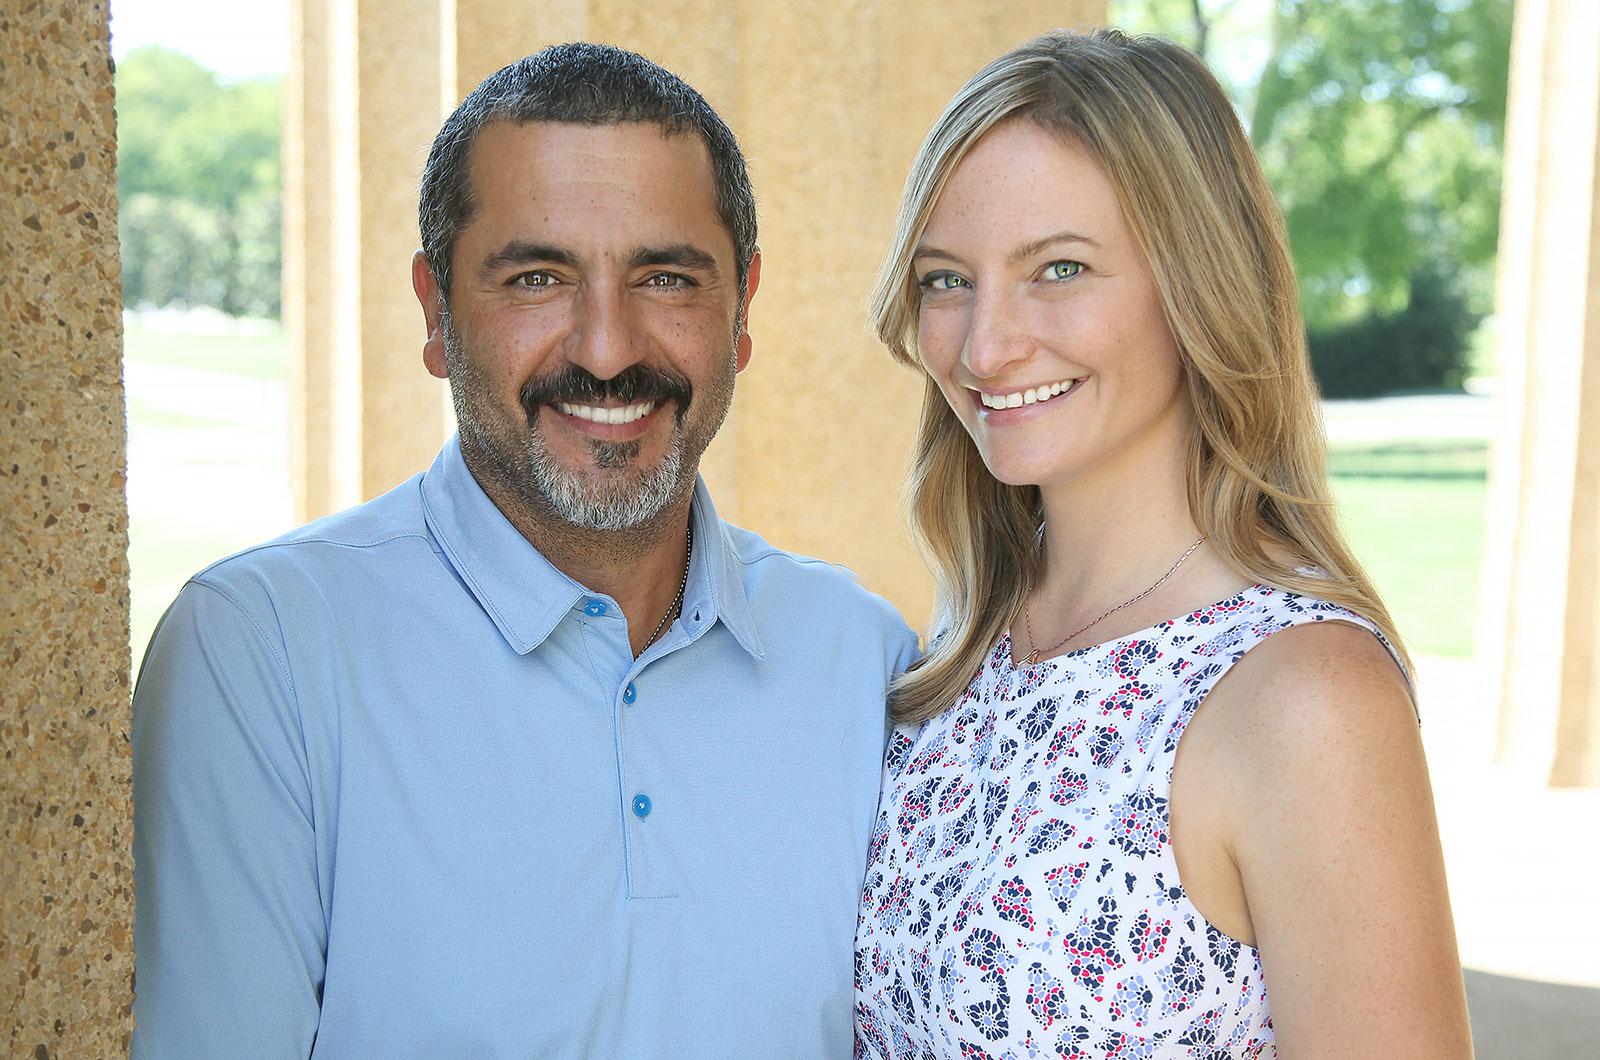 Dr. Ray & Melissa Saeedpour